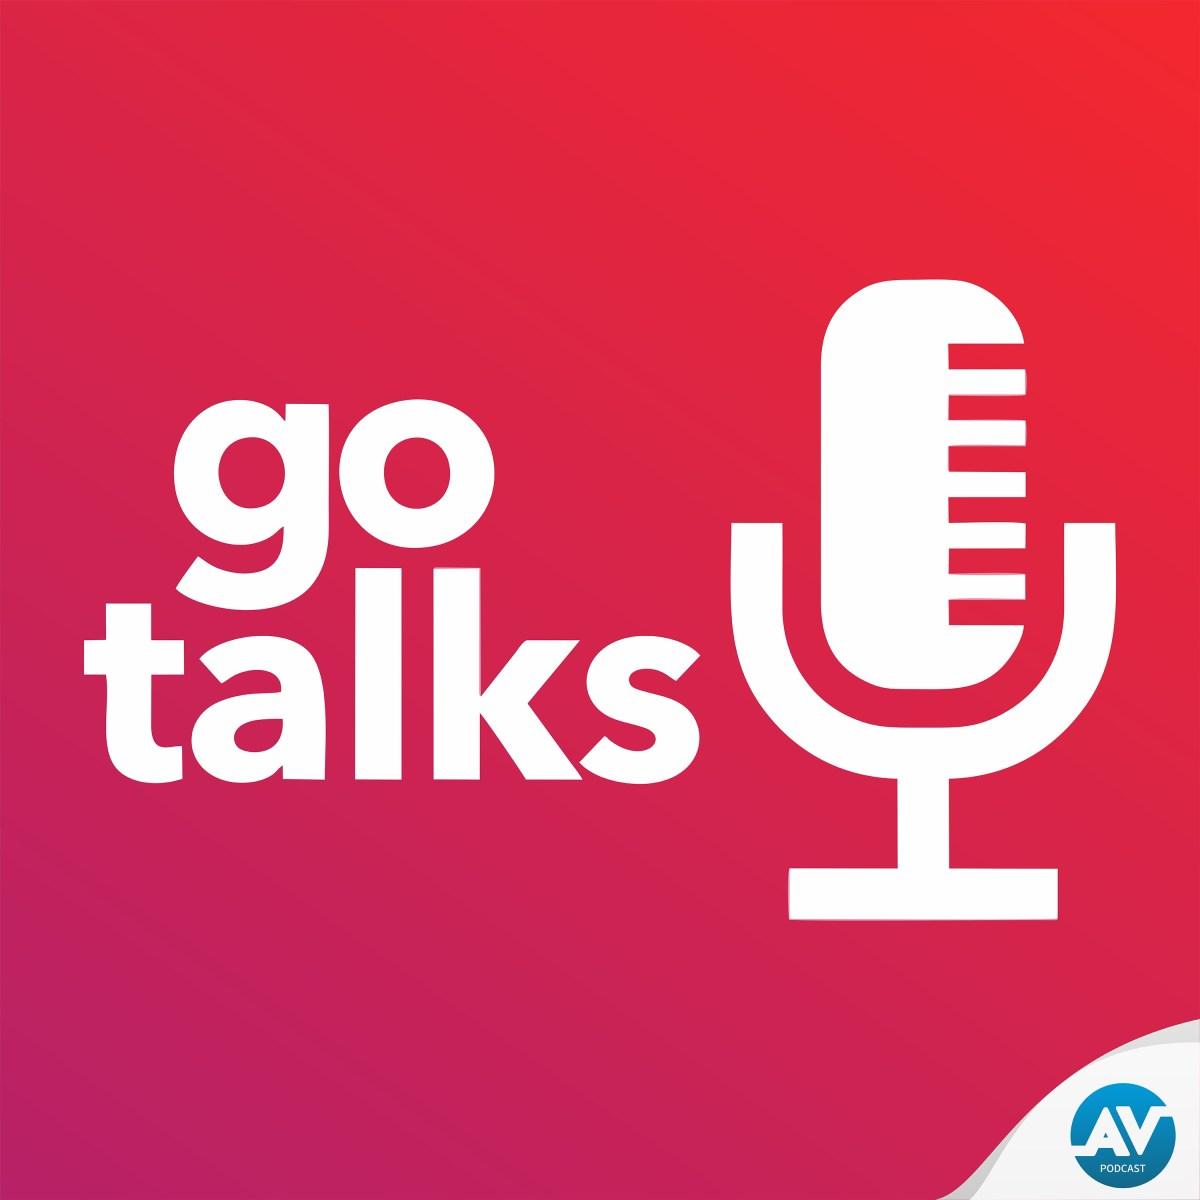 Go Talks